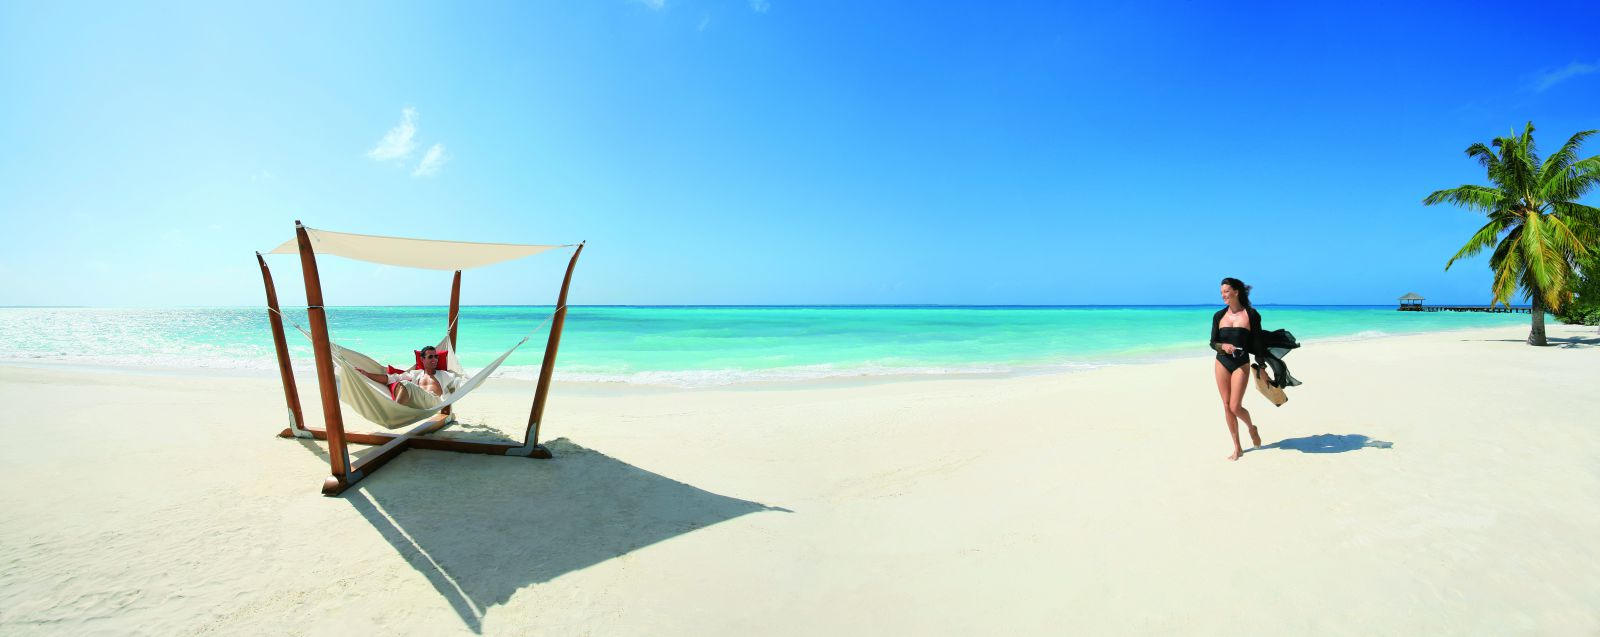 Vacaciones a medida a Polinesia Francesa